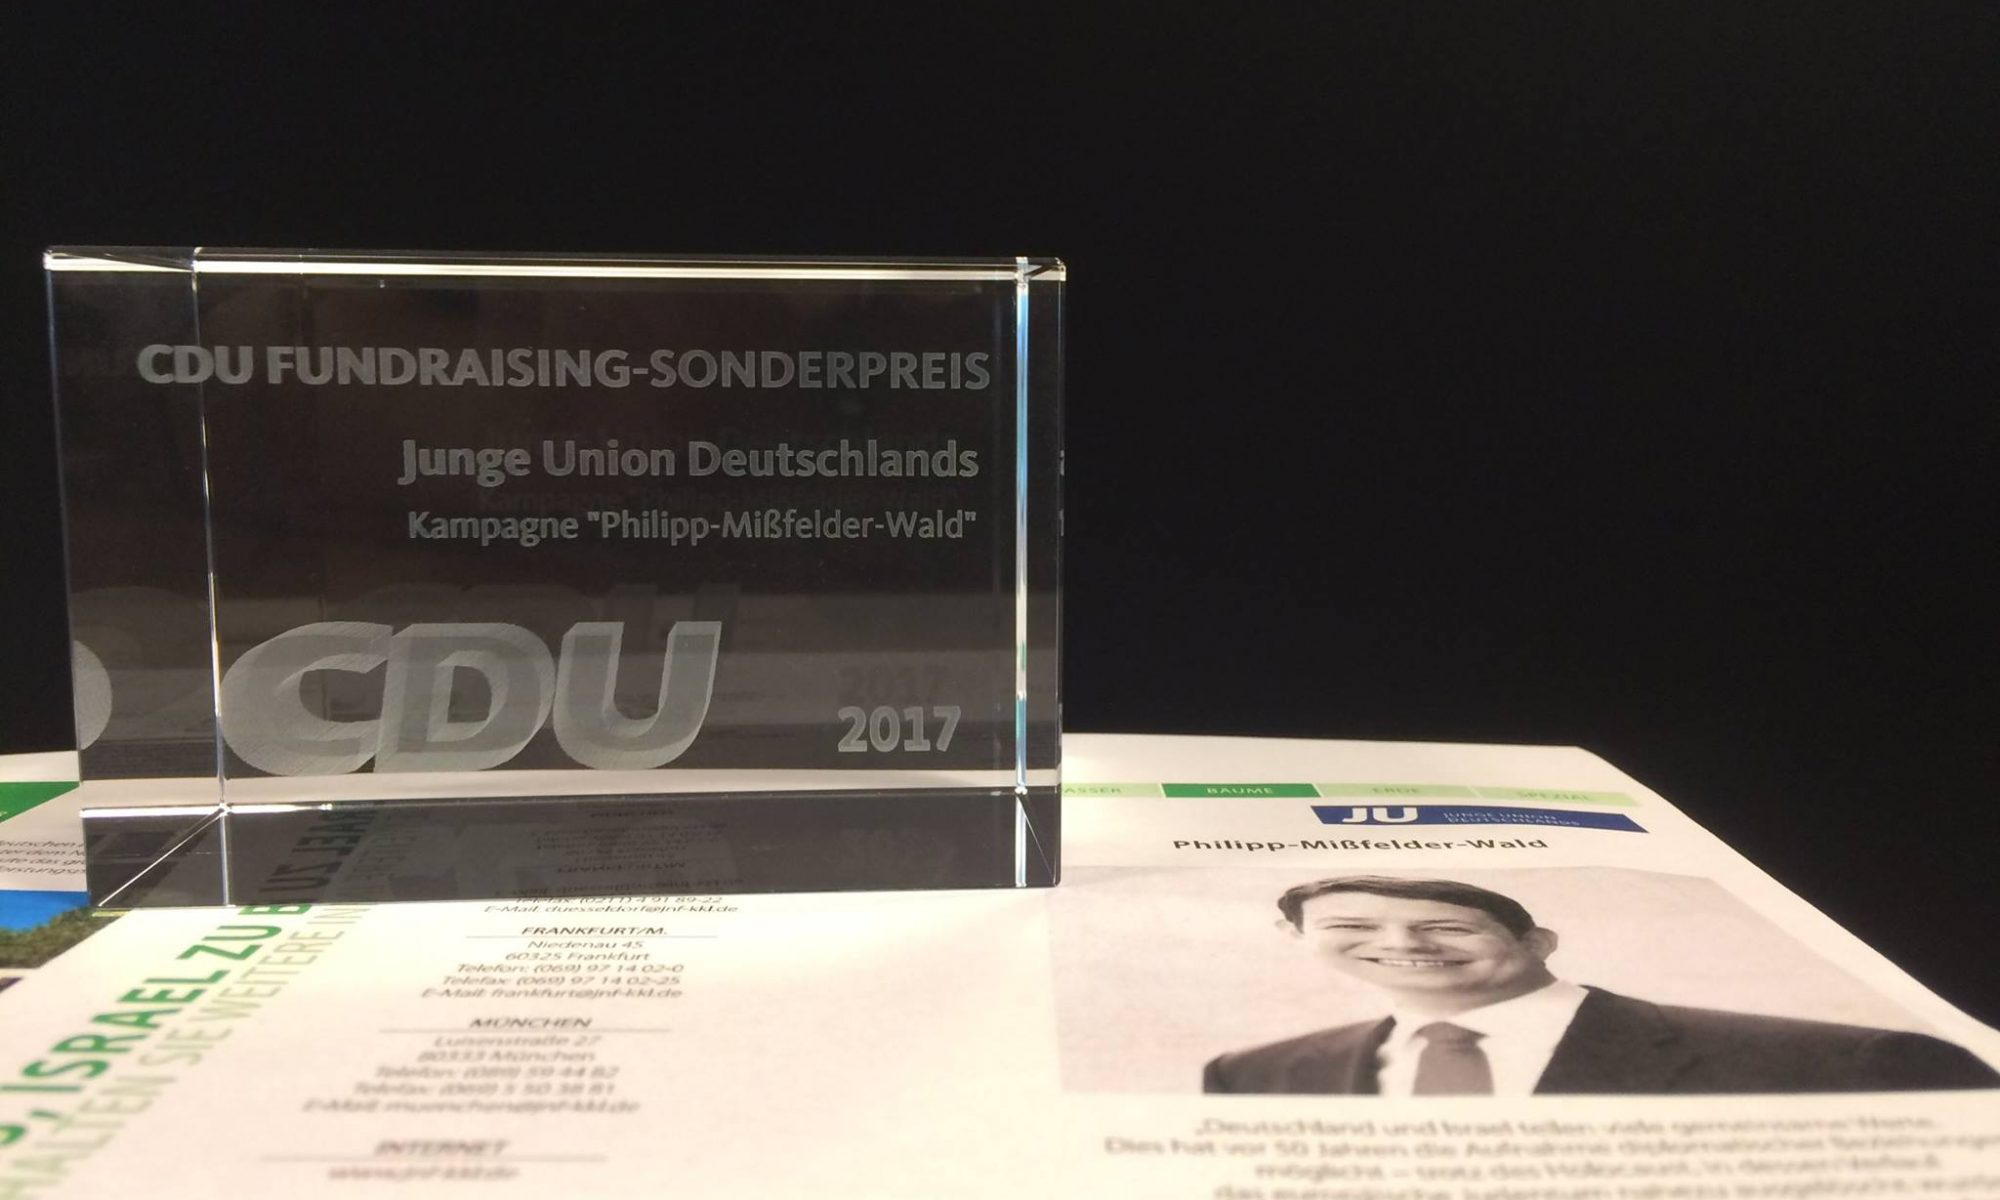 CDU Fundraising Sonderpreis